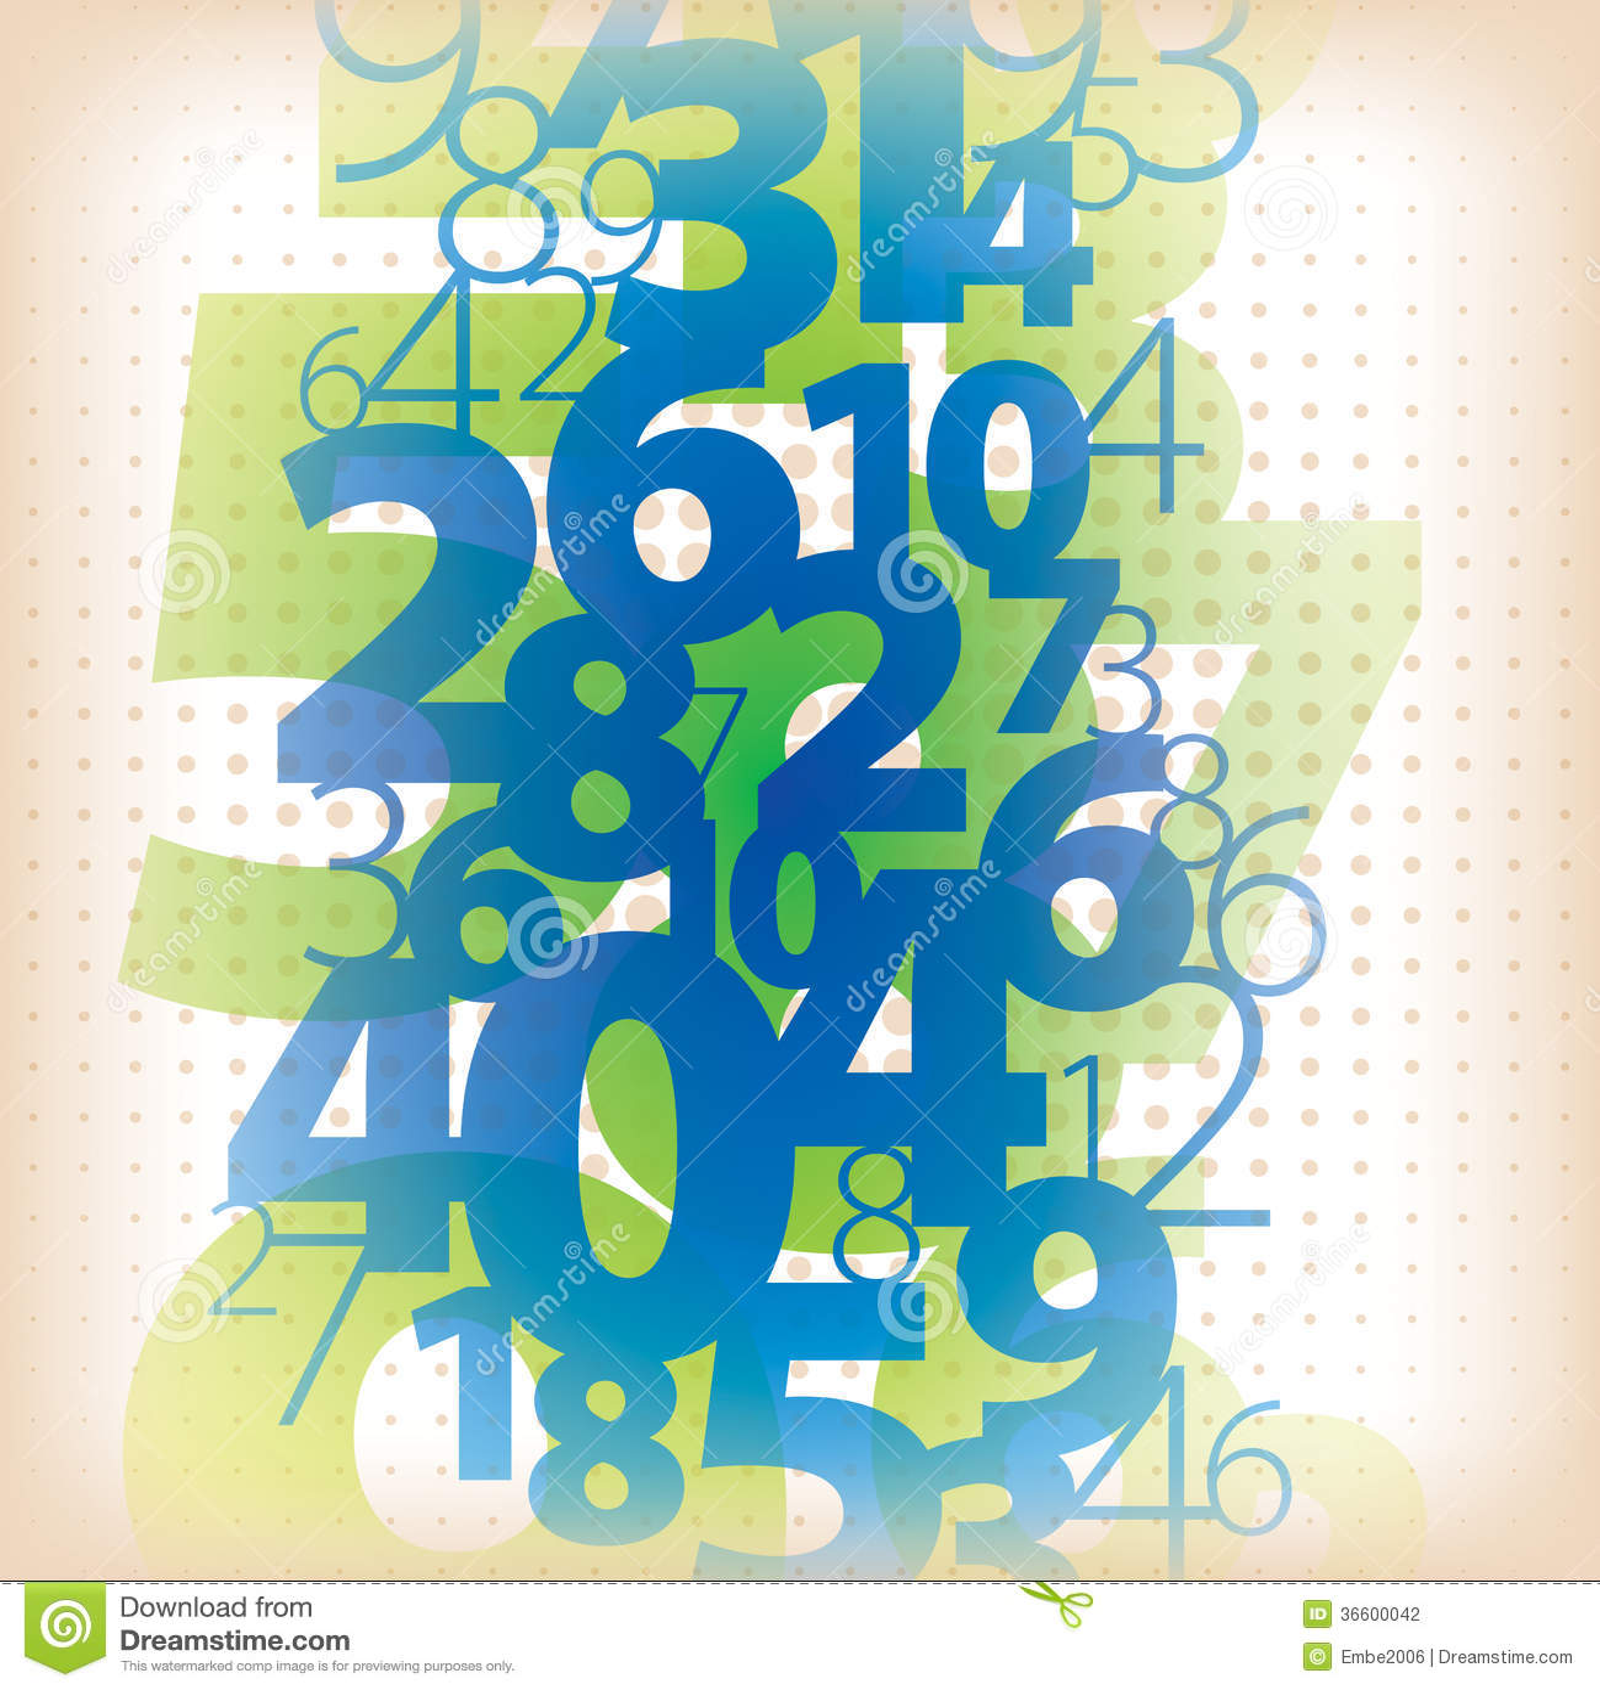 math number background stock vector. illustration of floating - 36600042